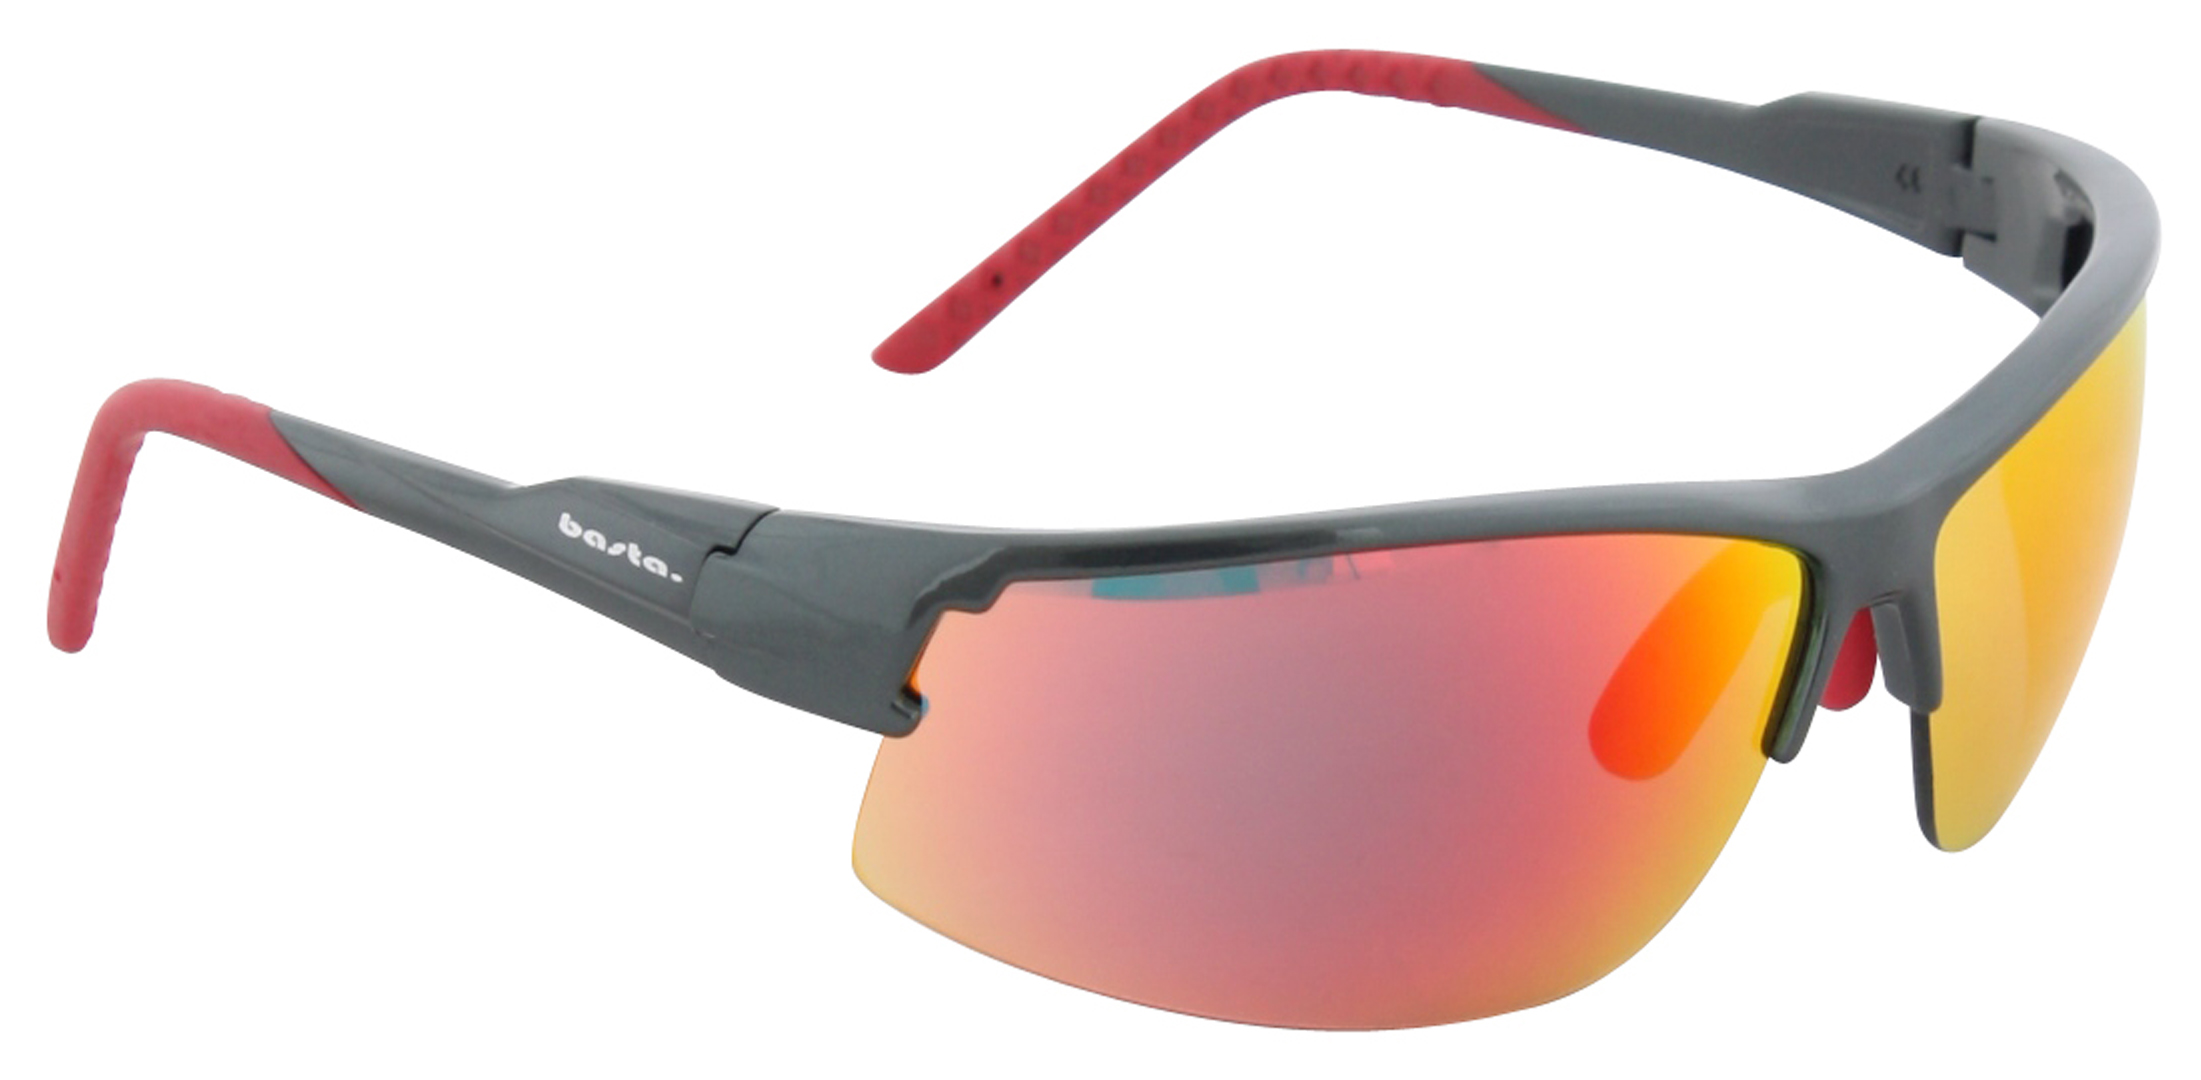 BASTA GREENFEE Sonnenbrille black/red kBMGb9yTf4